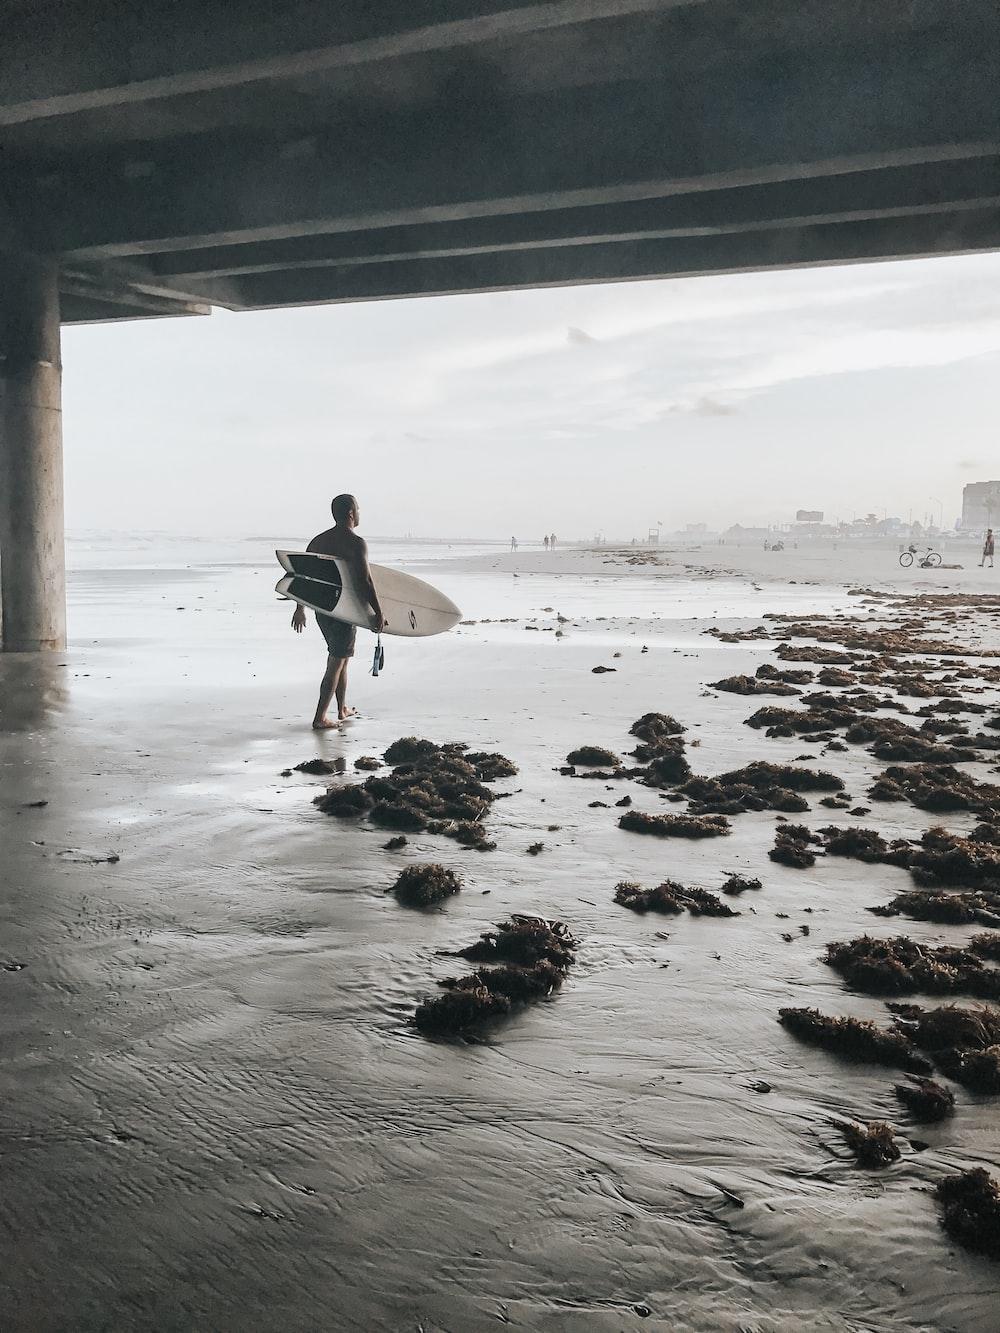 man walking on sea carrying surfboard